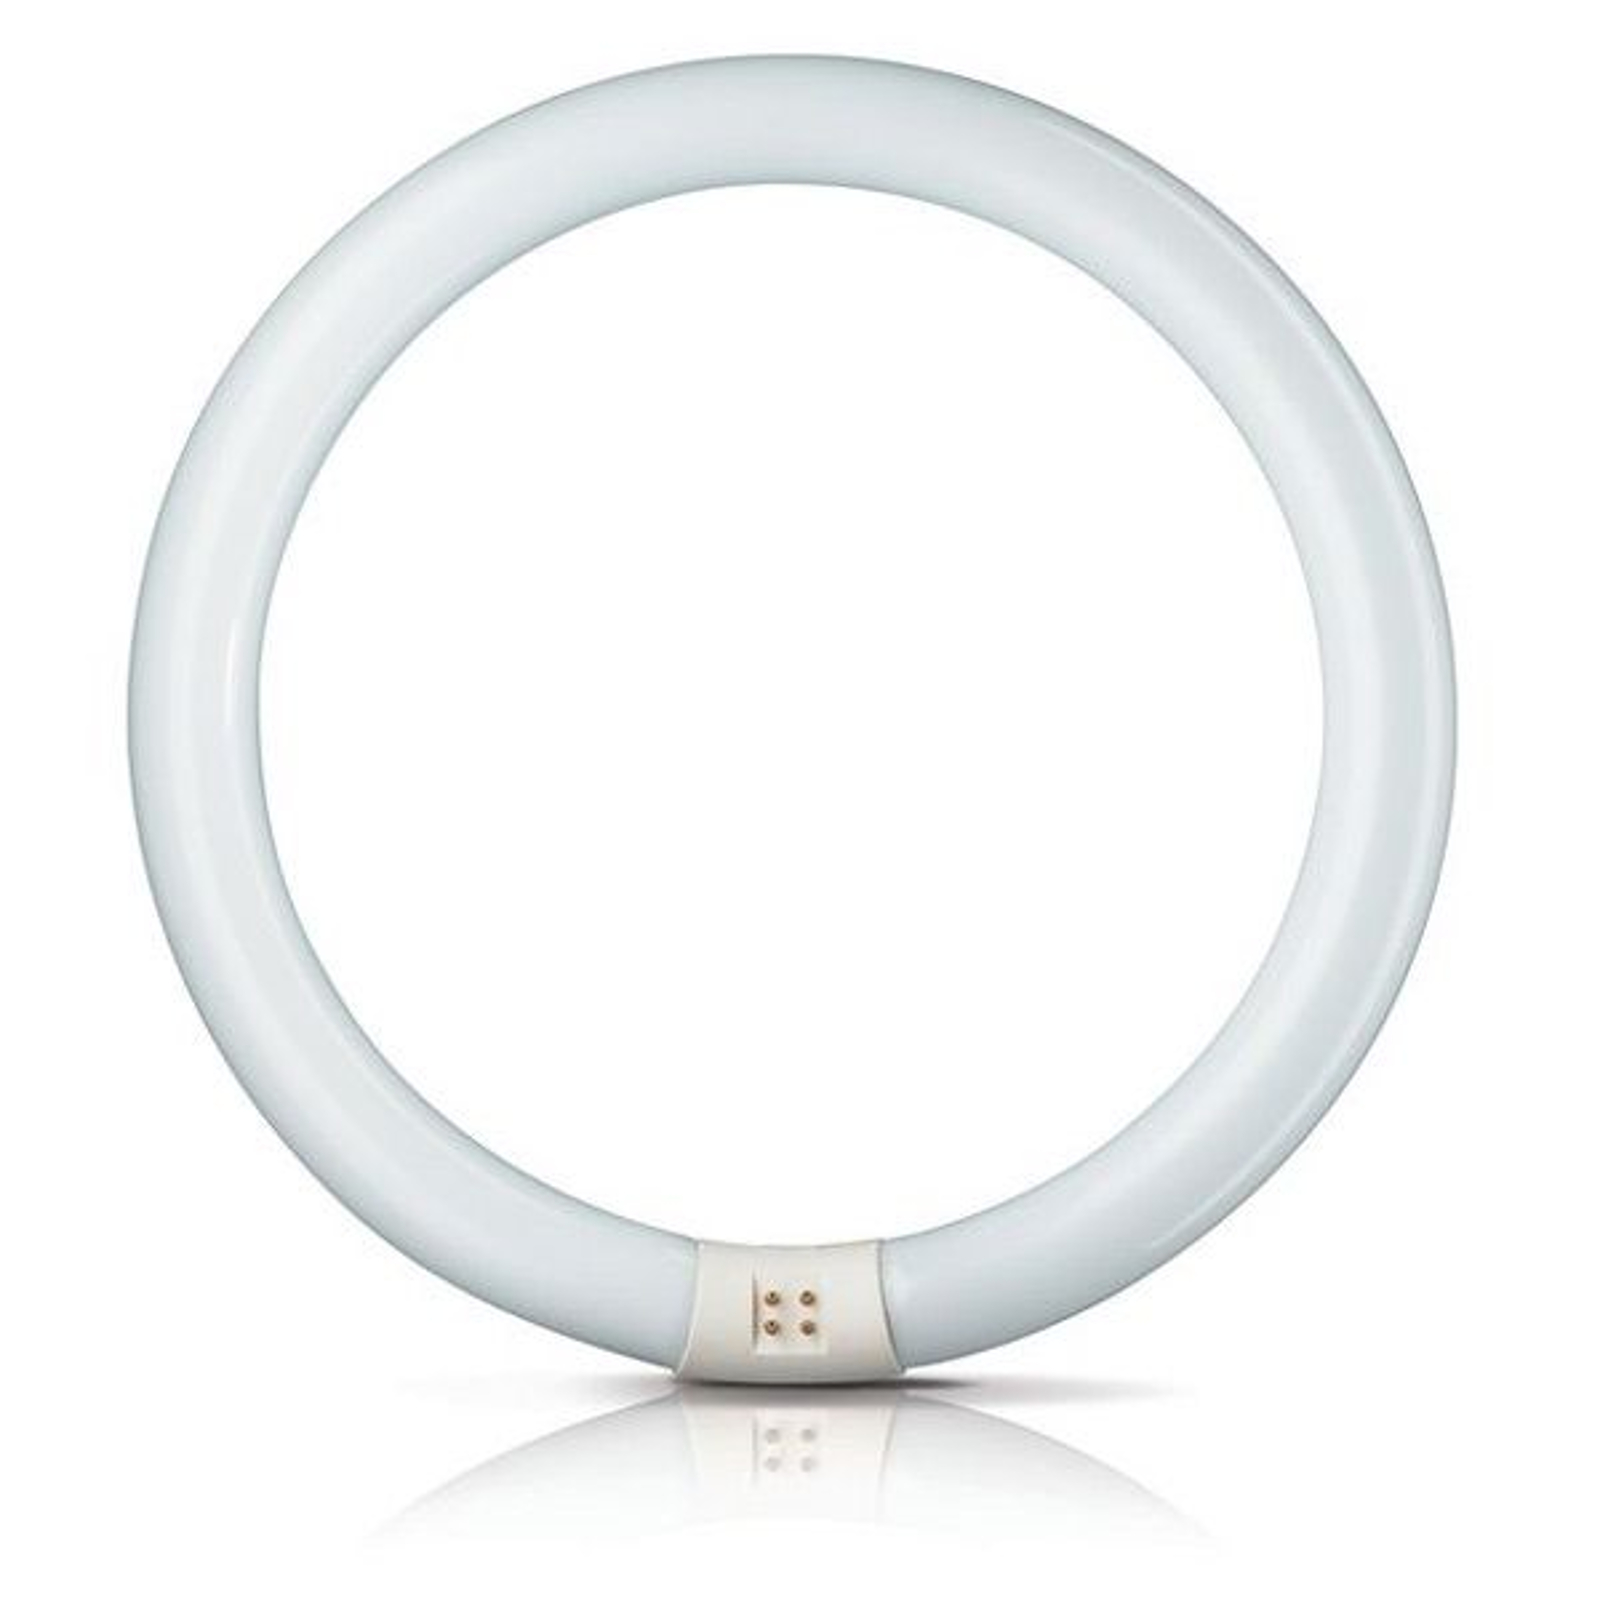 G10q 40W 830 Leuchtstoffring Master Circular TL-E